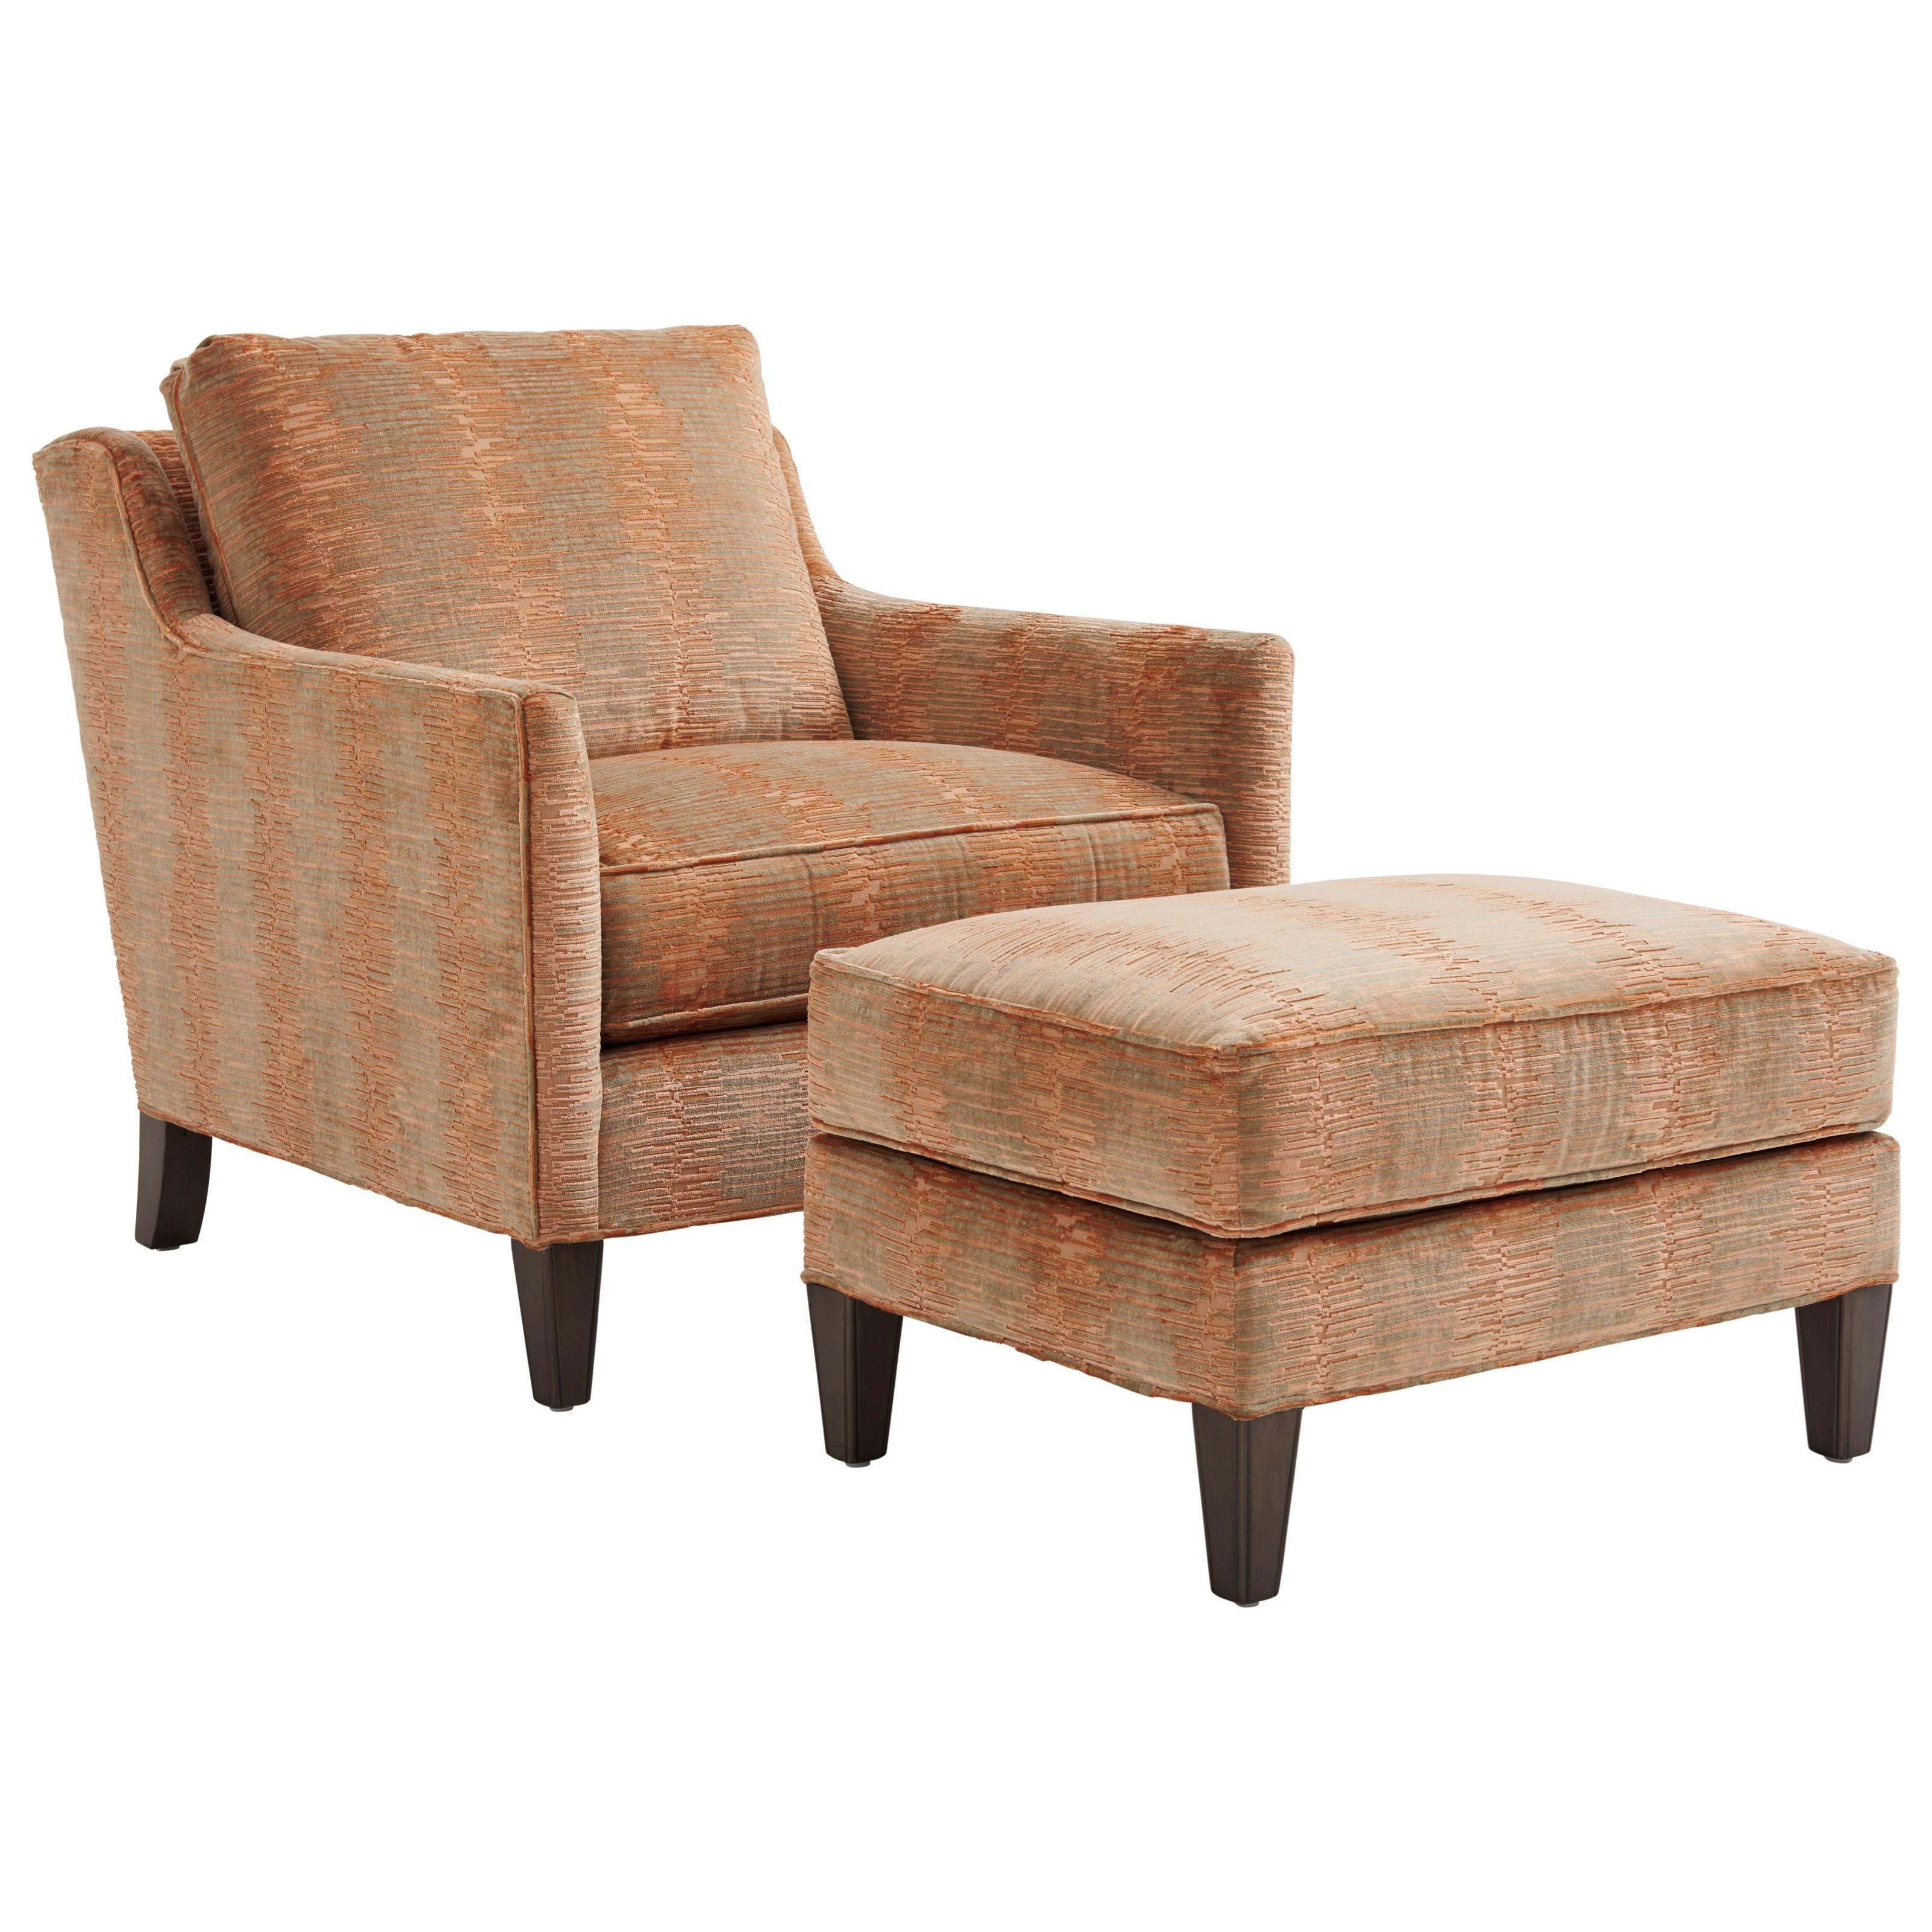 Ariana Turin Chair & Ottoman by Lexington at Baer's Furniture